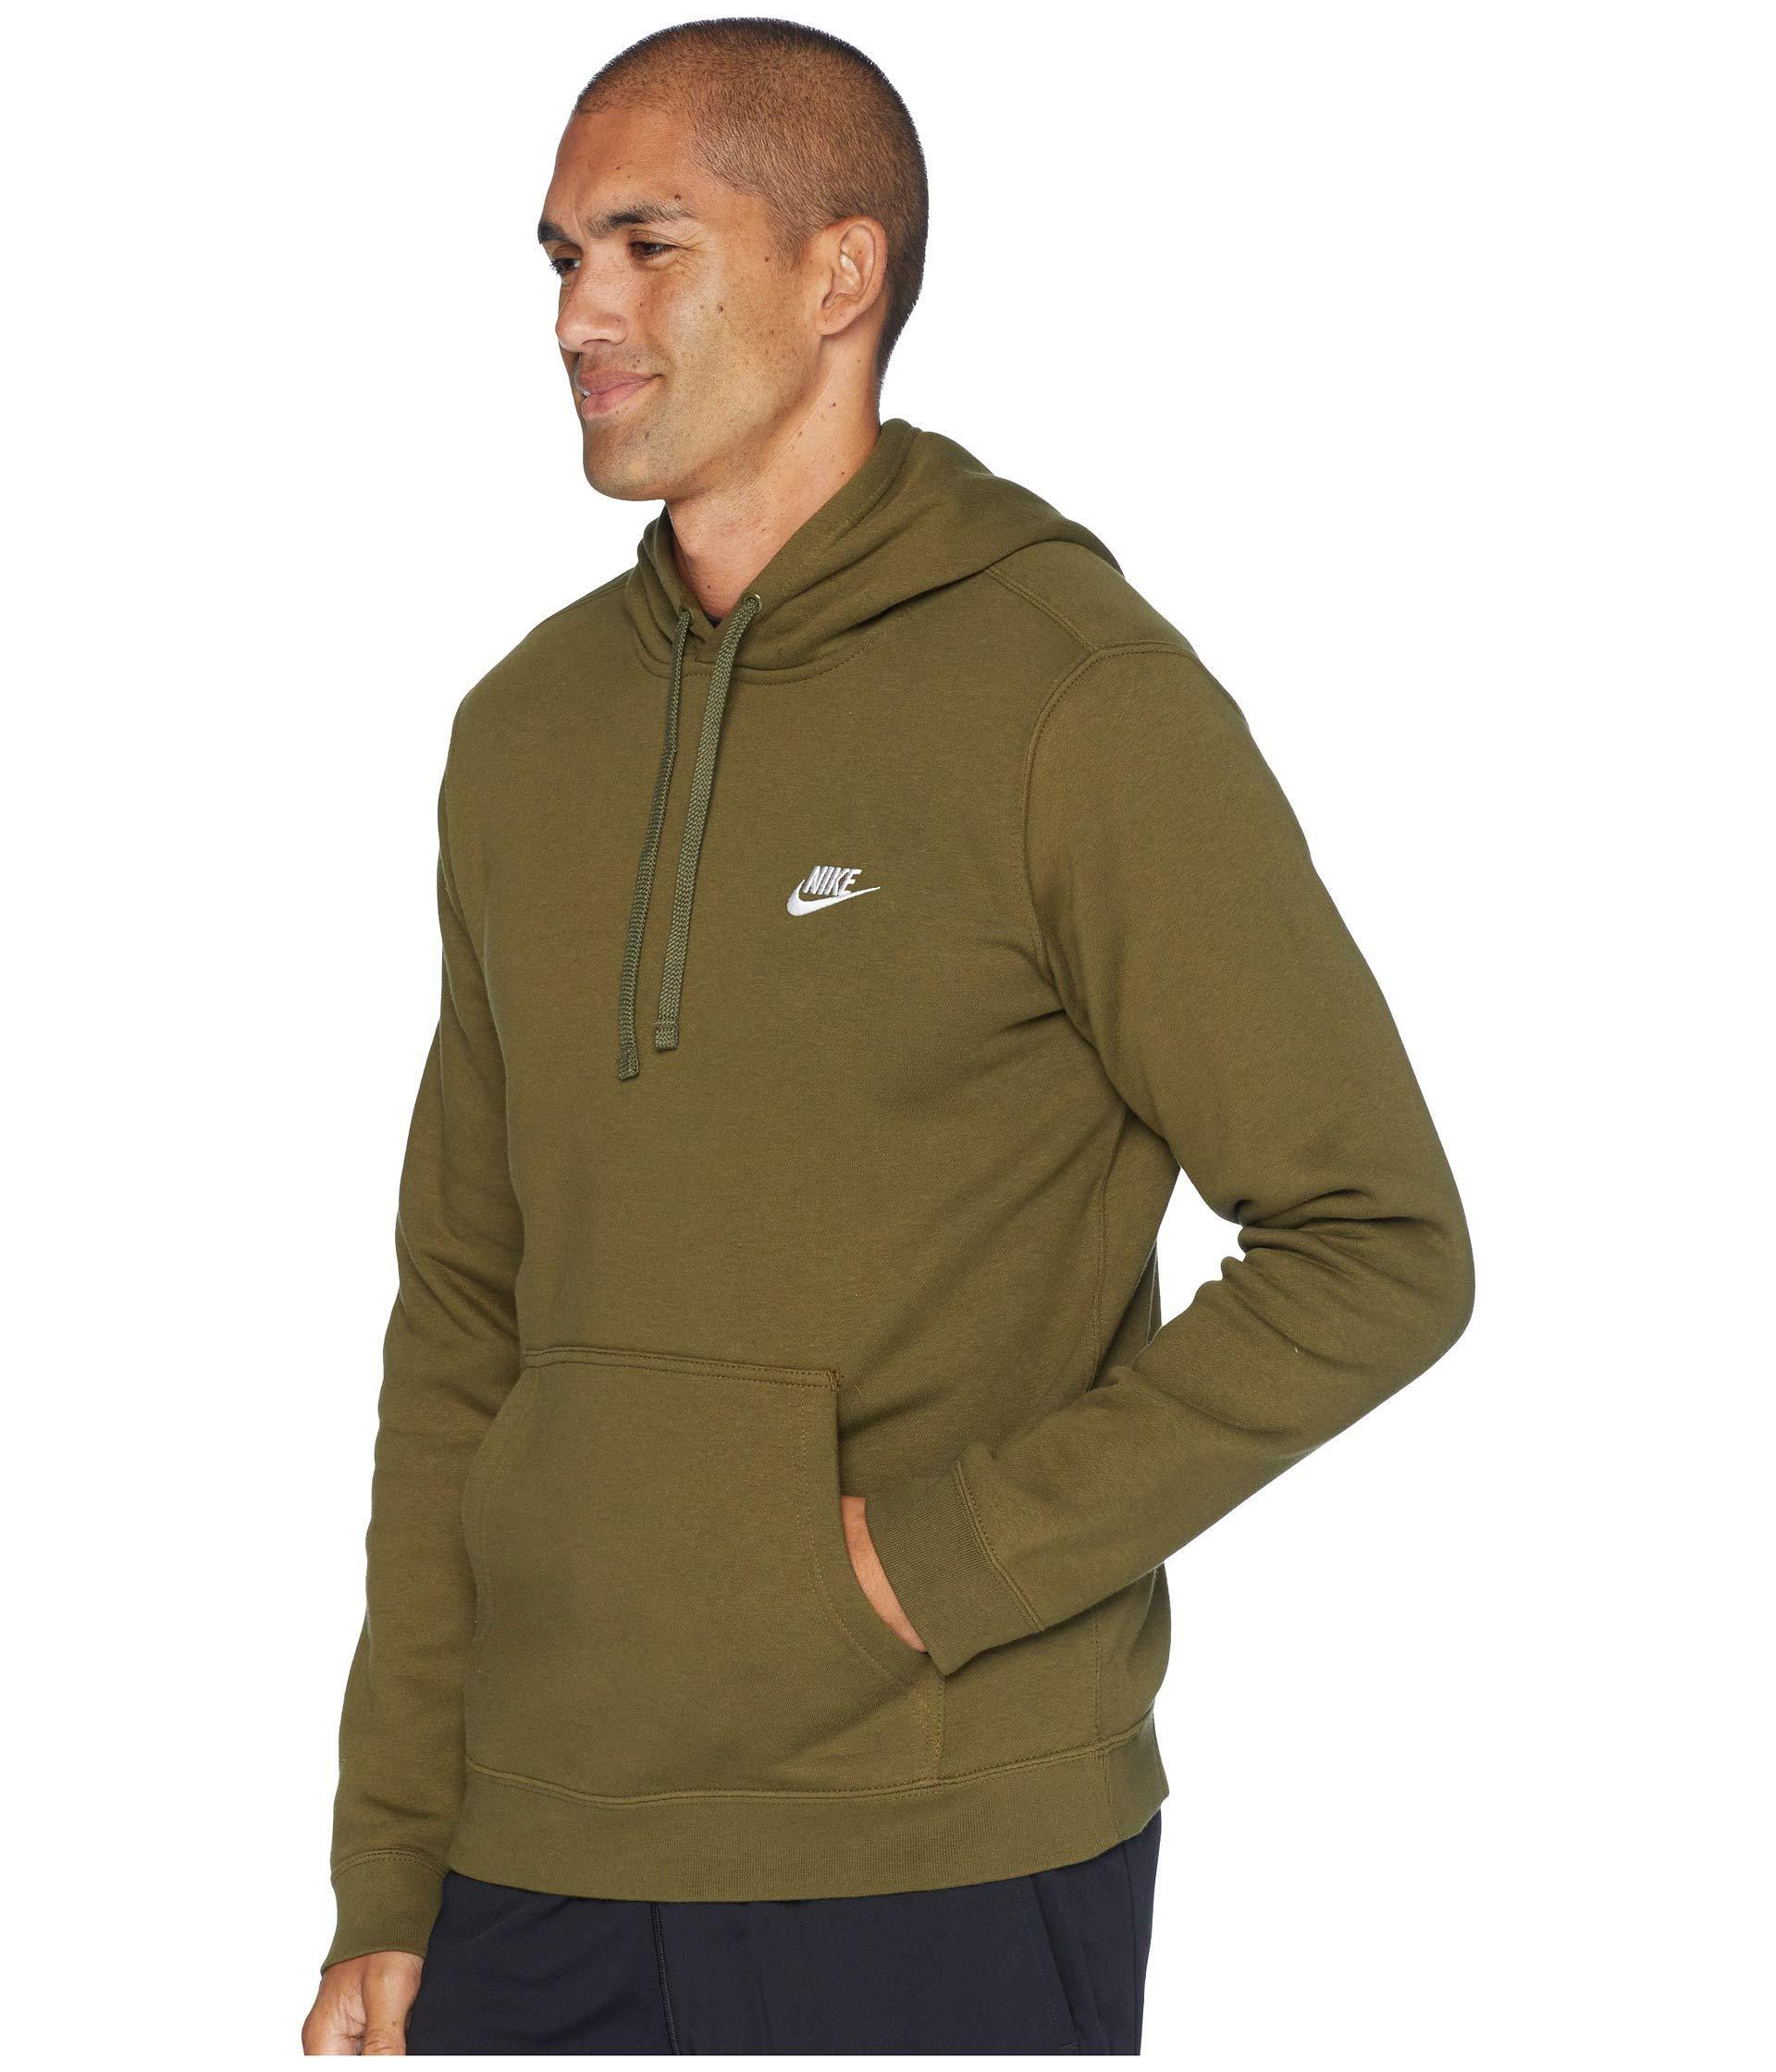 7f61bcc8da098 Lyst - Nike Club Fleece Pullover Hoodie in Green for Men